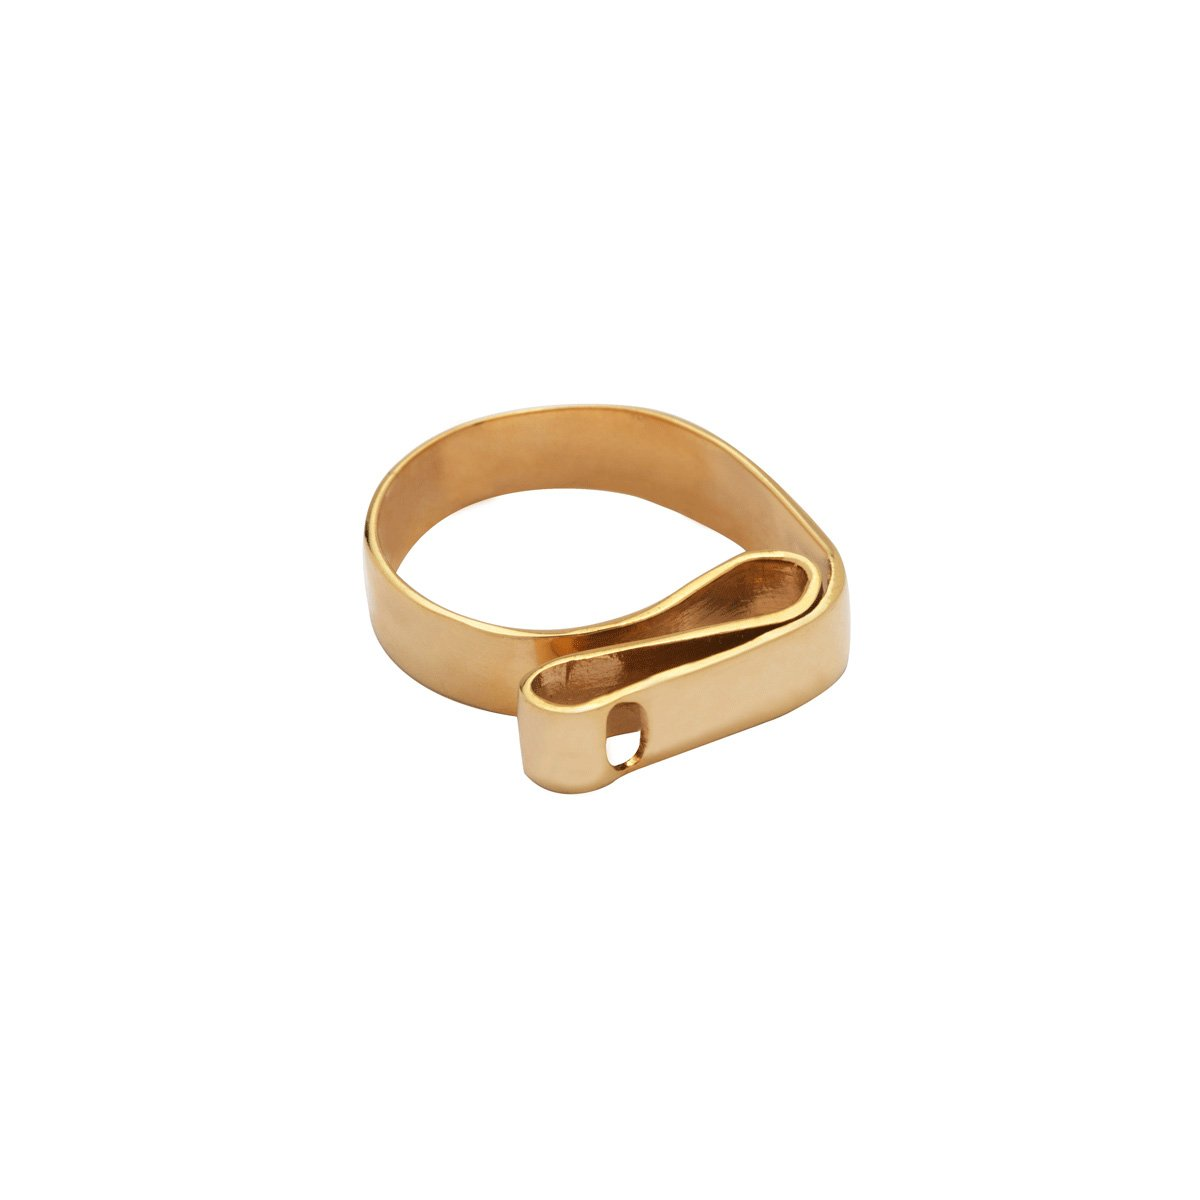 انگشتر طلا پلیت پیچ 2